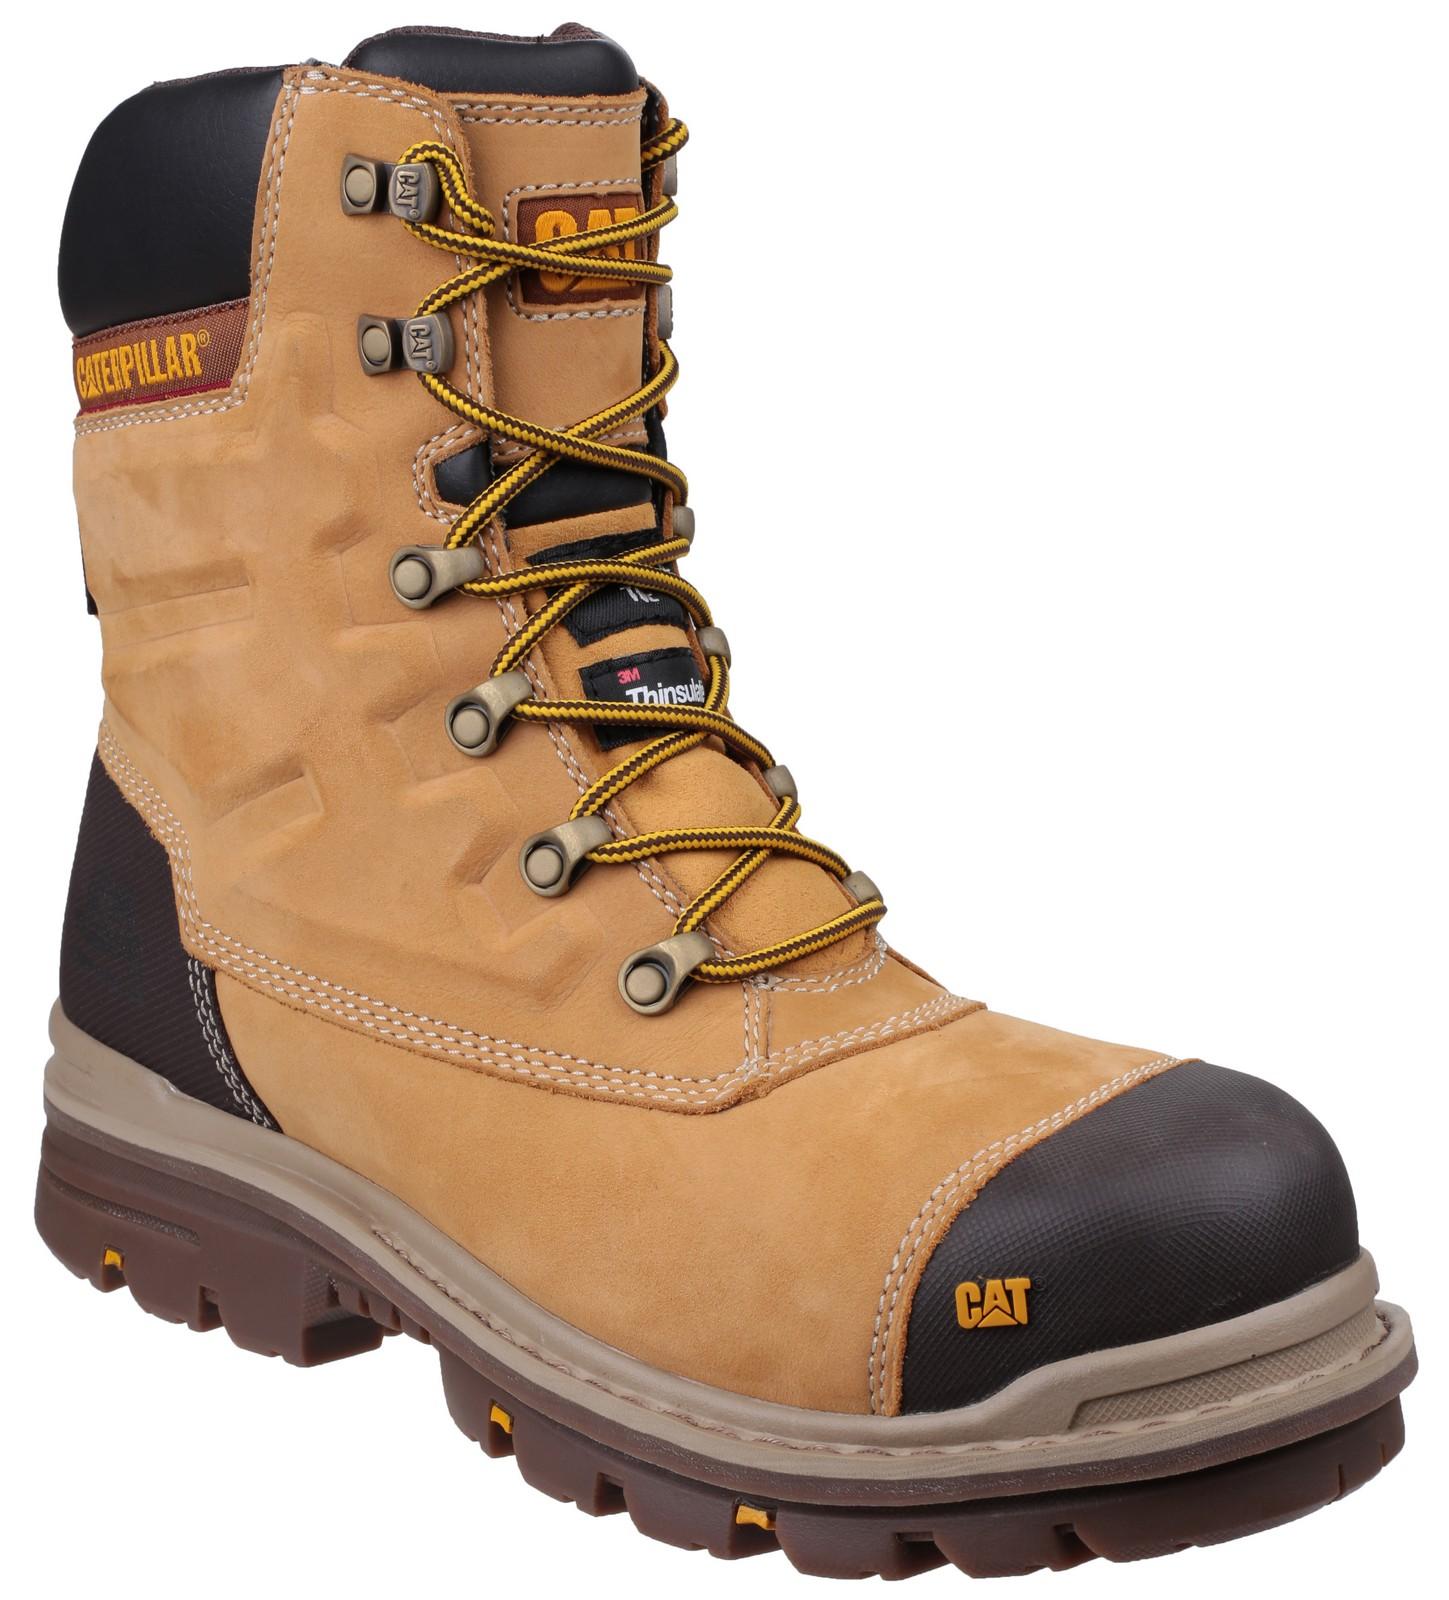 d220f8cefa7 Caterpillar Safety Boots Premier 8